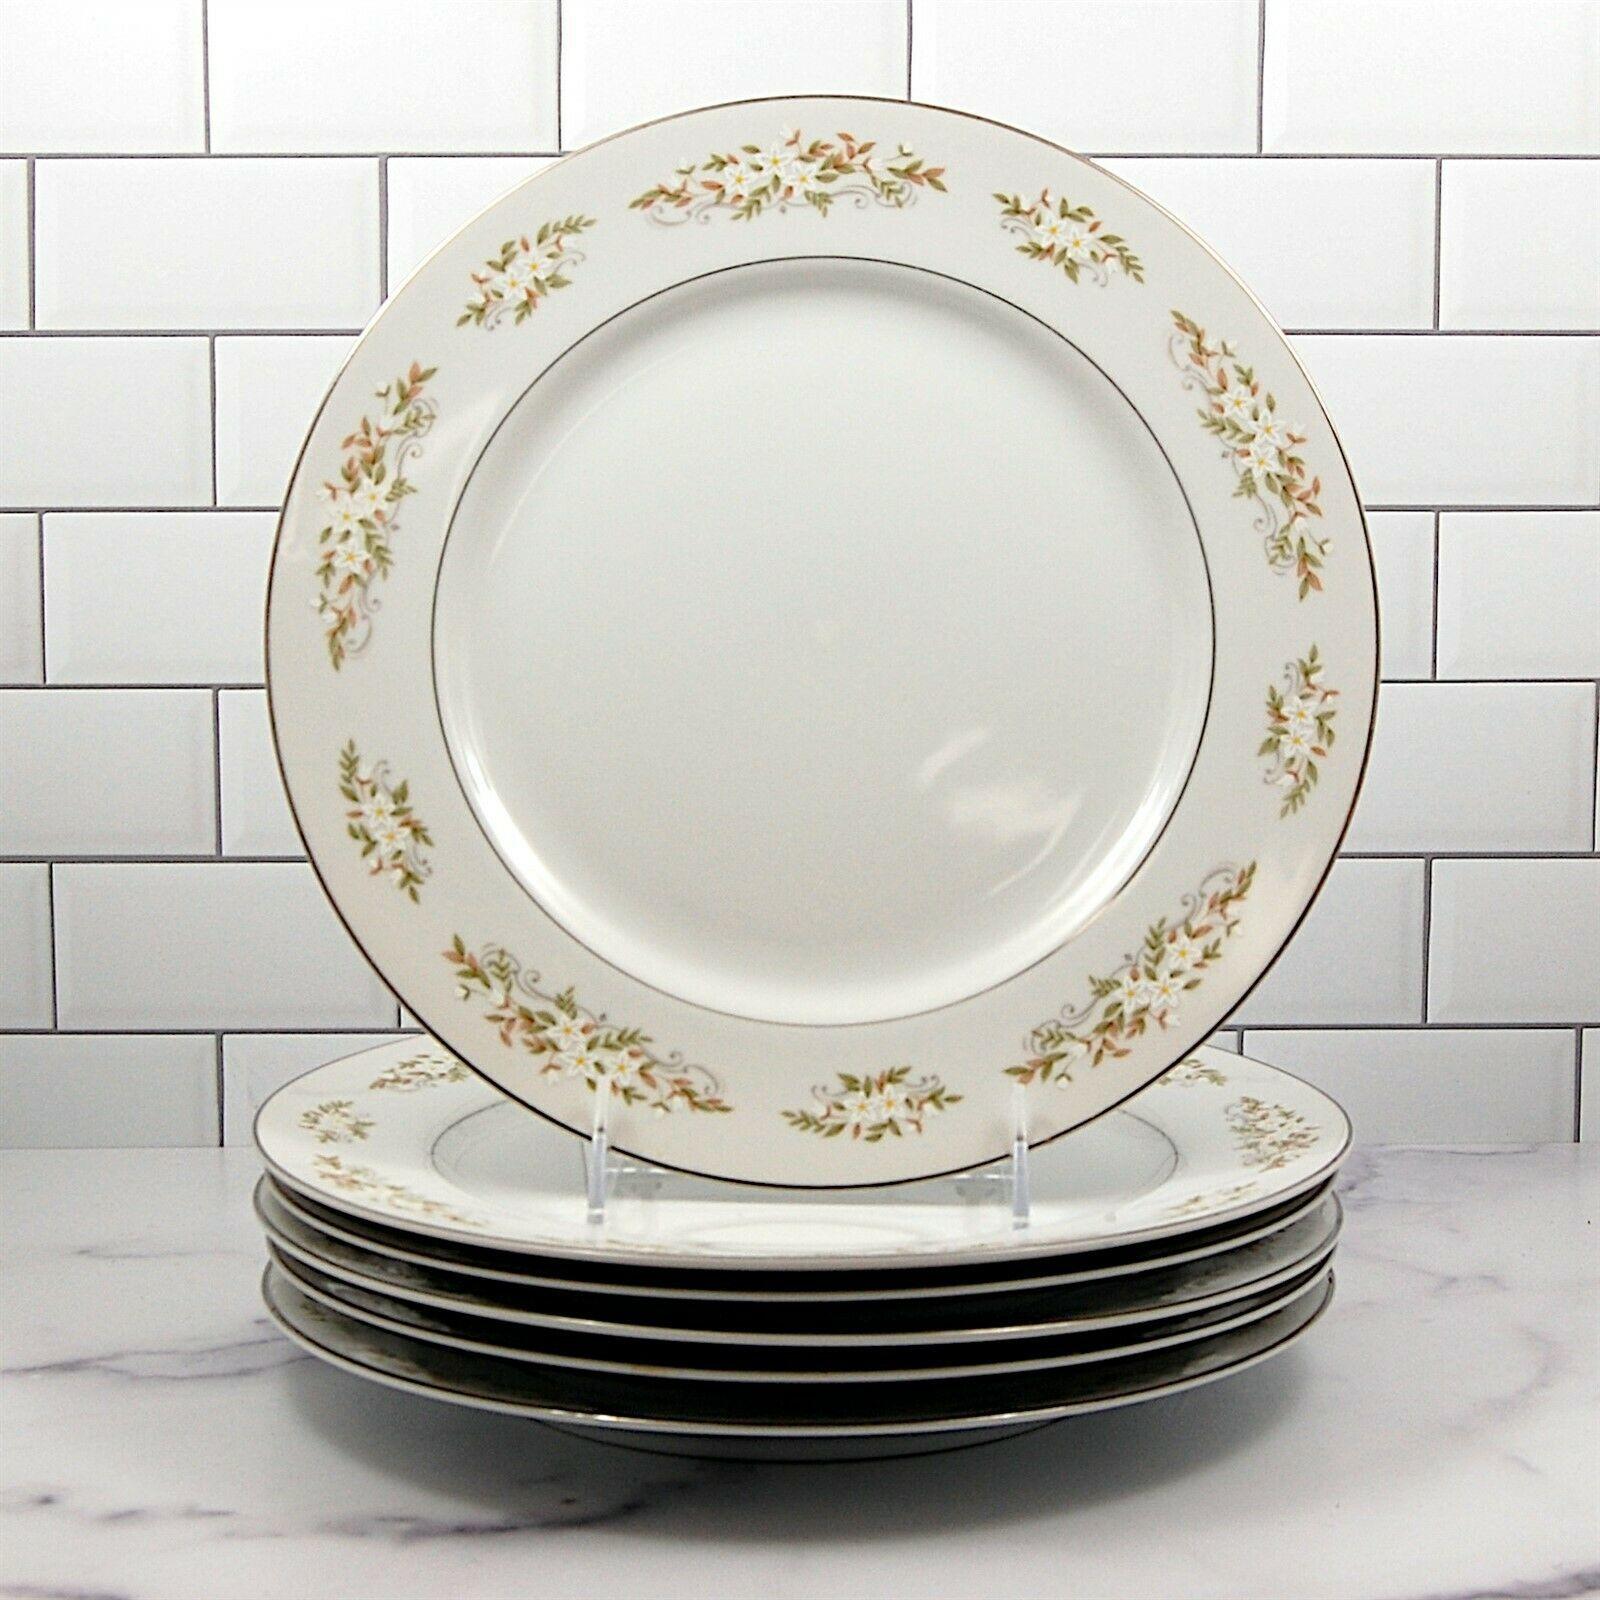 International Silver Co Springtime Japan Set of 6 Dinner Plates 10.25 in (26cm) - $33.24